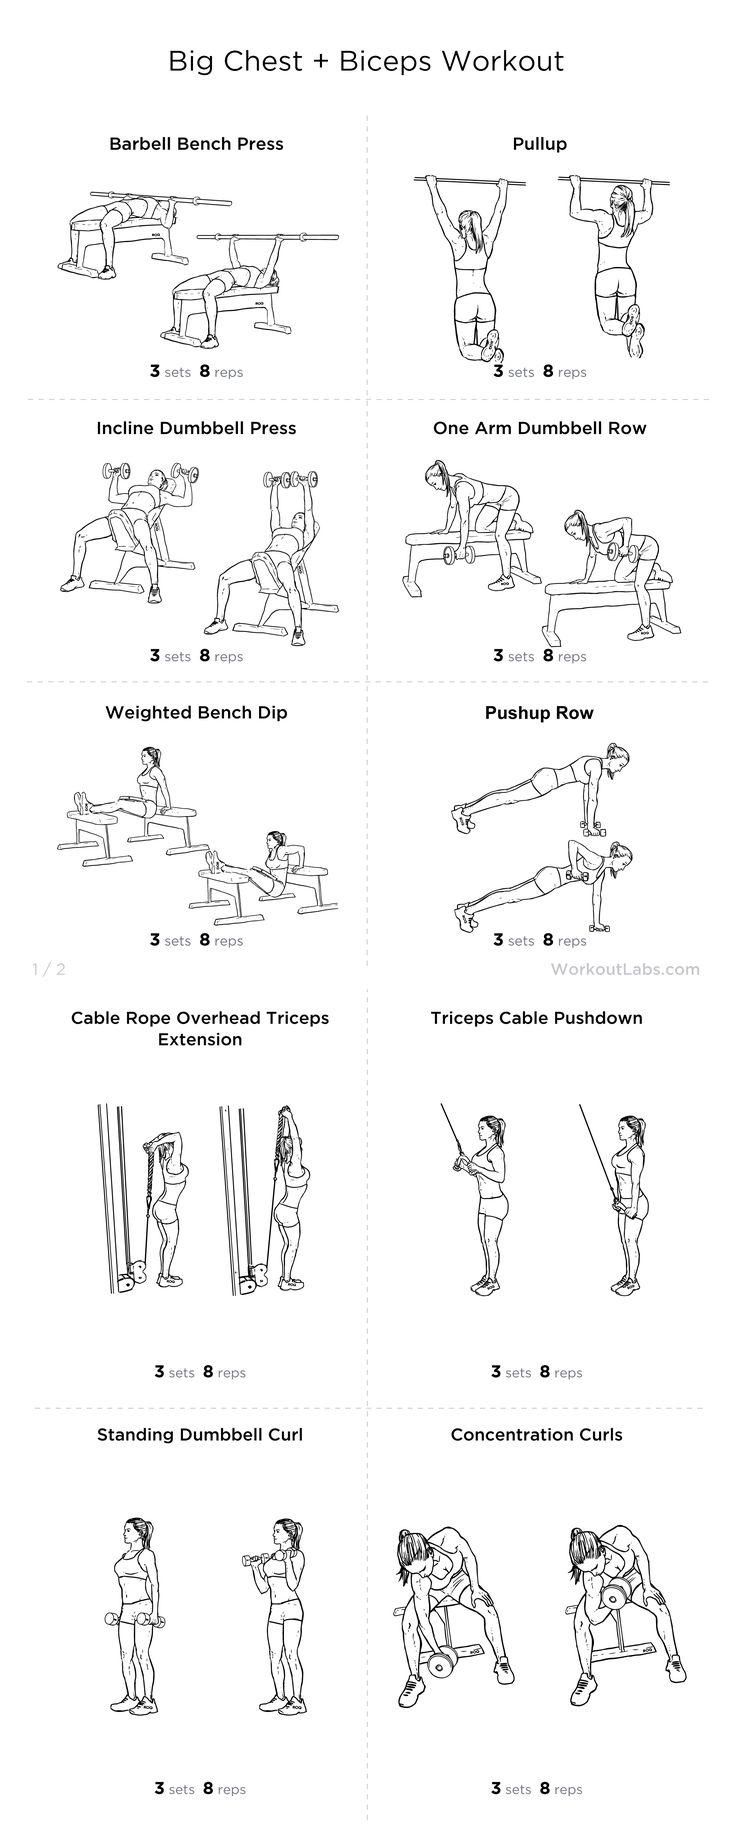 Big Chest + Biceps Workout Workouts! Pinterest